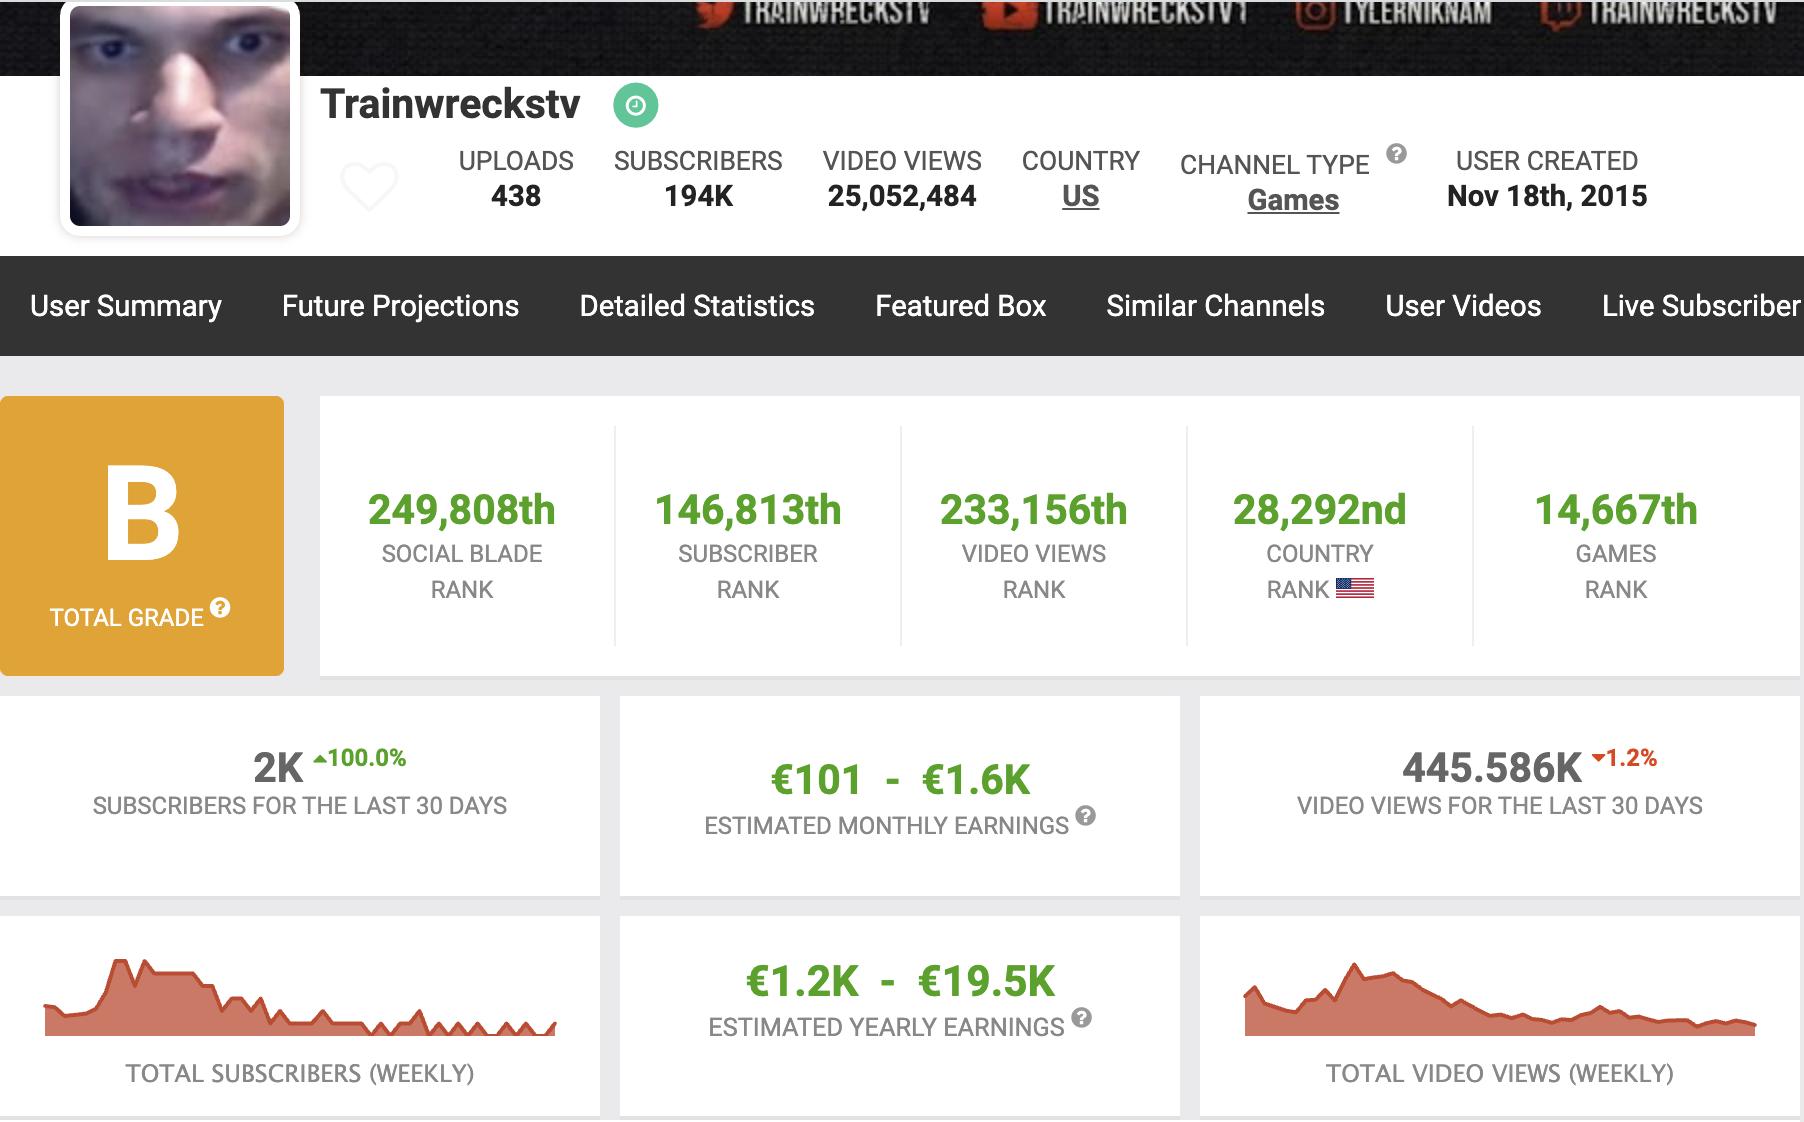 Trainwreckstv net worth from YouTube.